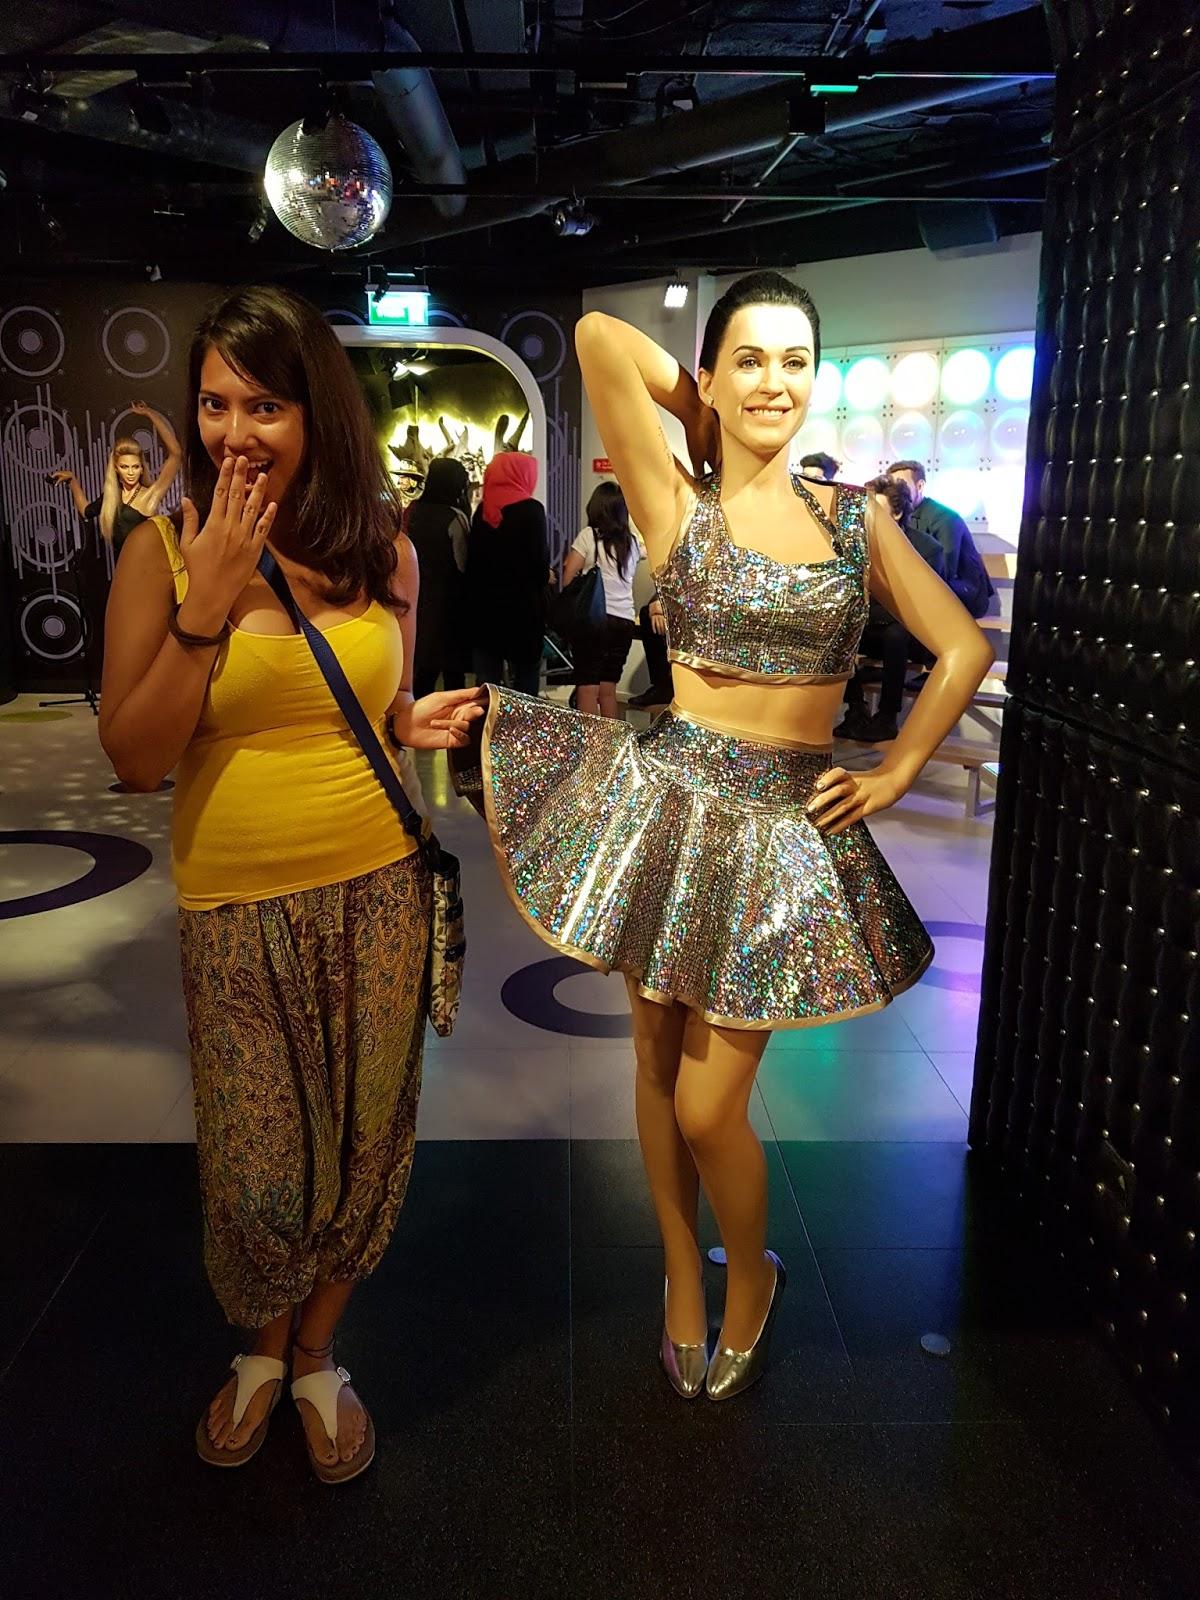 Madame Tussauds Bangkok review and how to go - Ummi Goes Where?